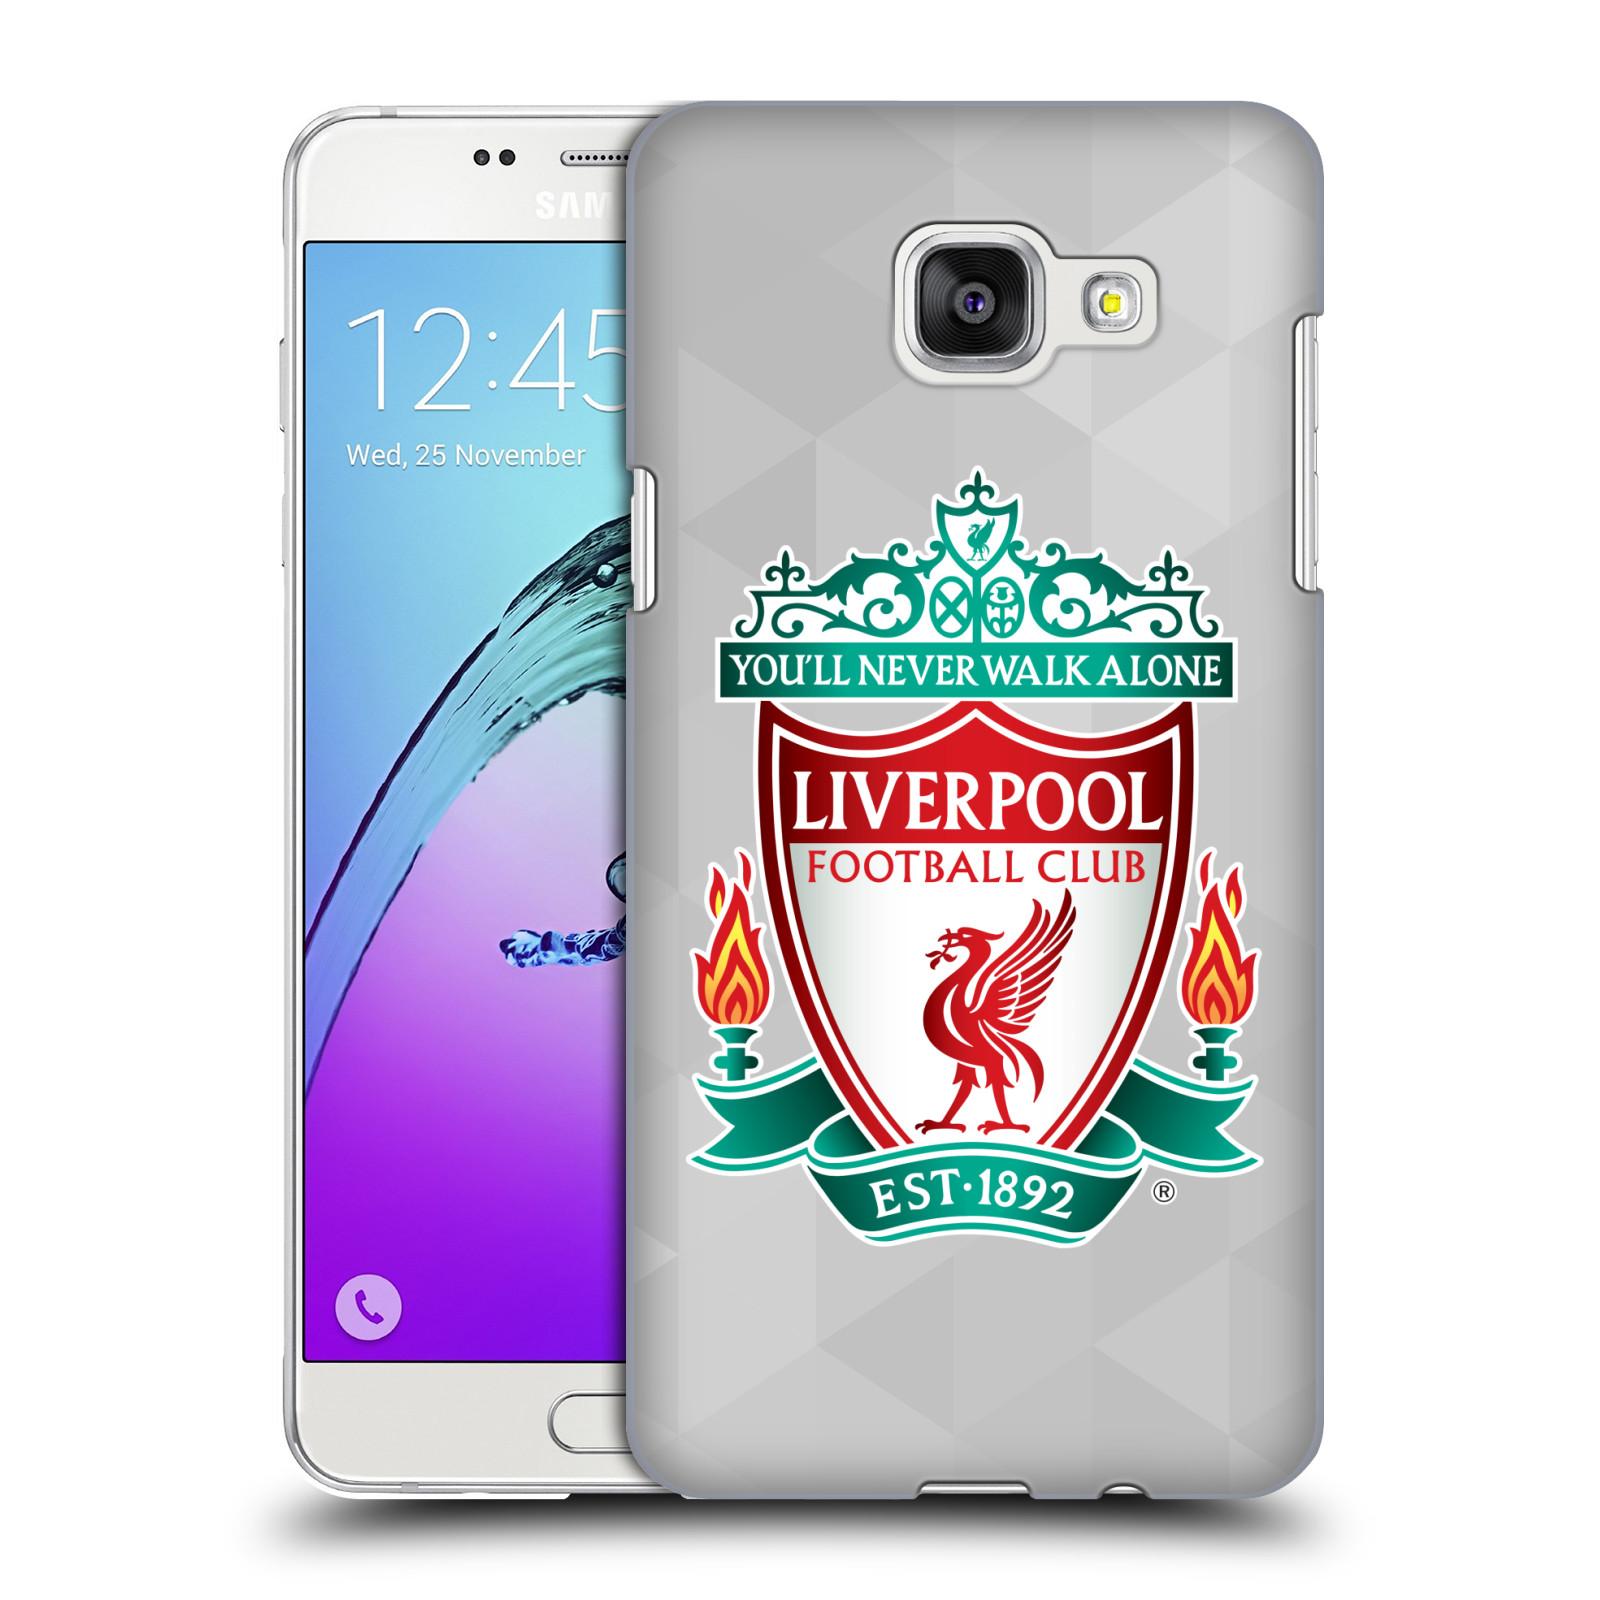 Plastové pouzdro na mobil Samsung Galaxy A5 (2016) HEAD CASE ZNAK LIVERPOOL FC OFFICIAL GEOMETRIC WHITE